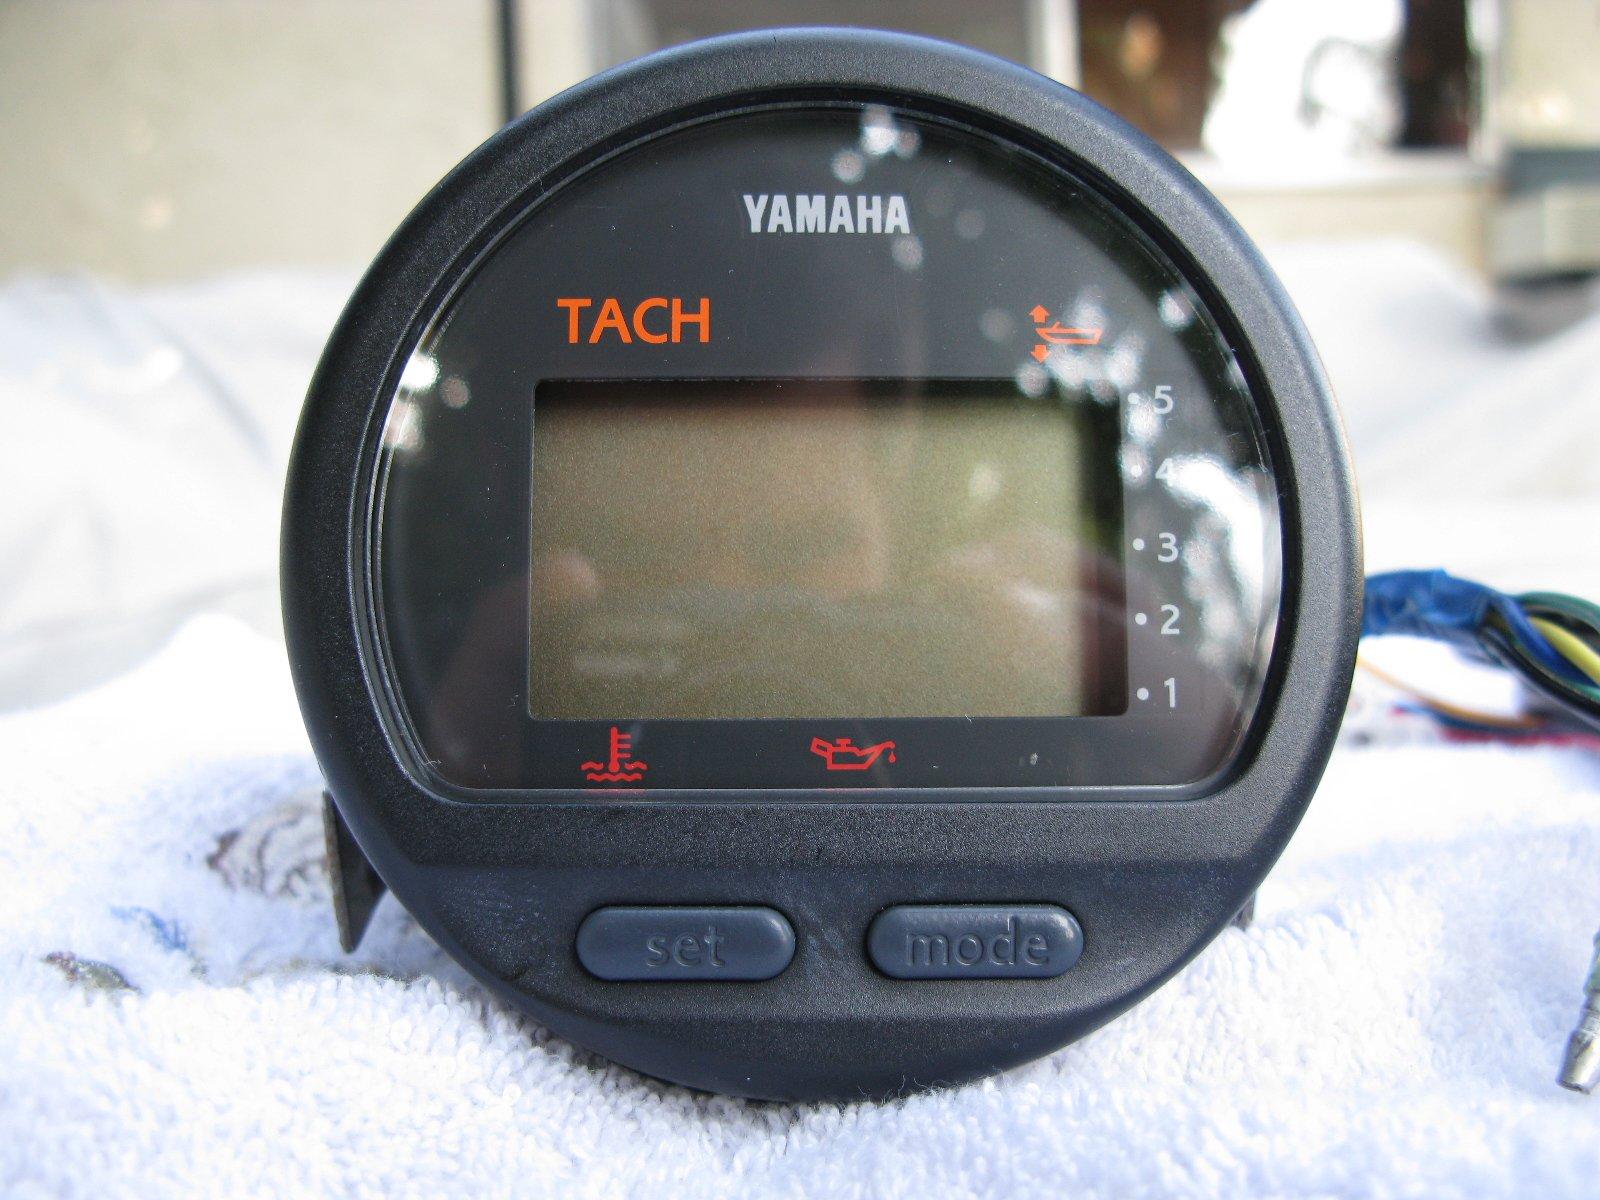 Yamaha 6YR-W0035-E1-00 TACH RIG KIT 2004 an; 6YRW0035E100 Made by Yamaha